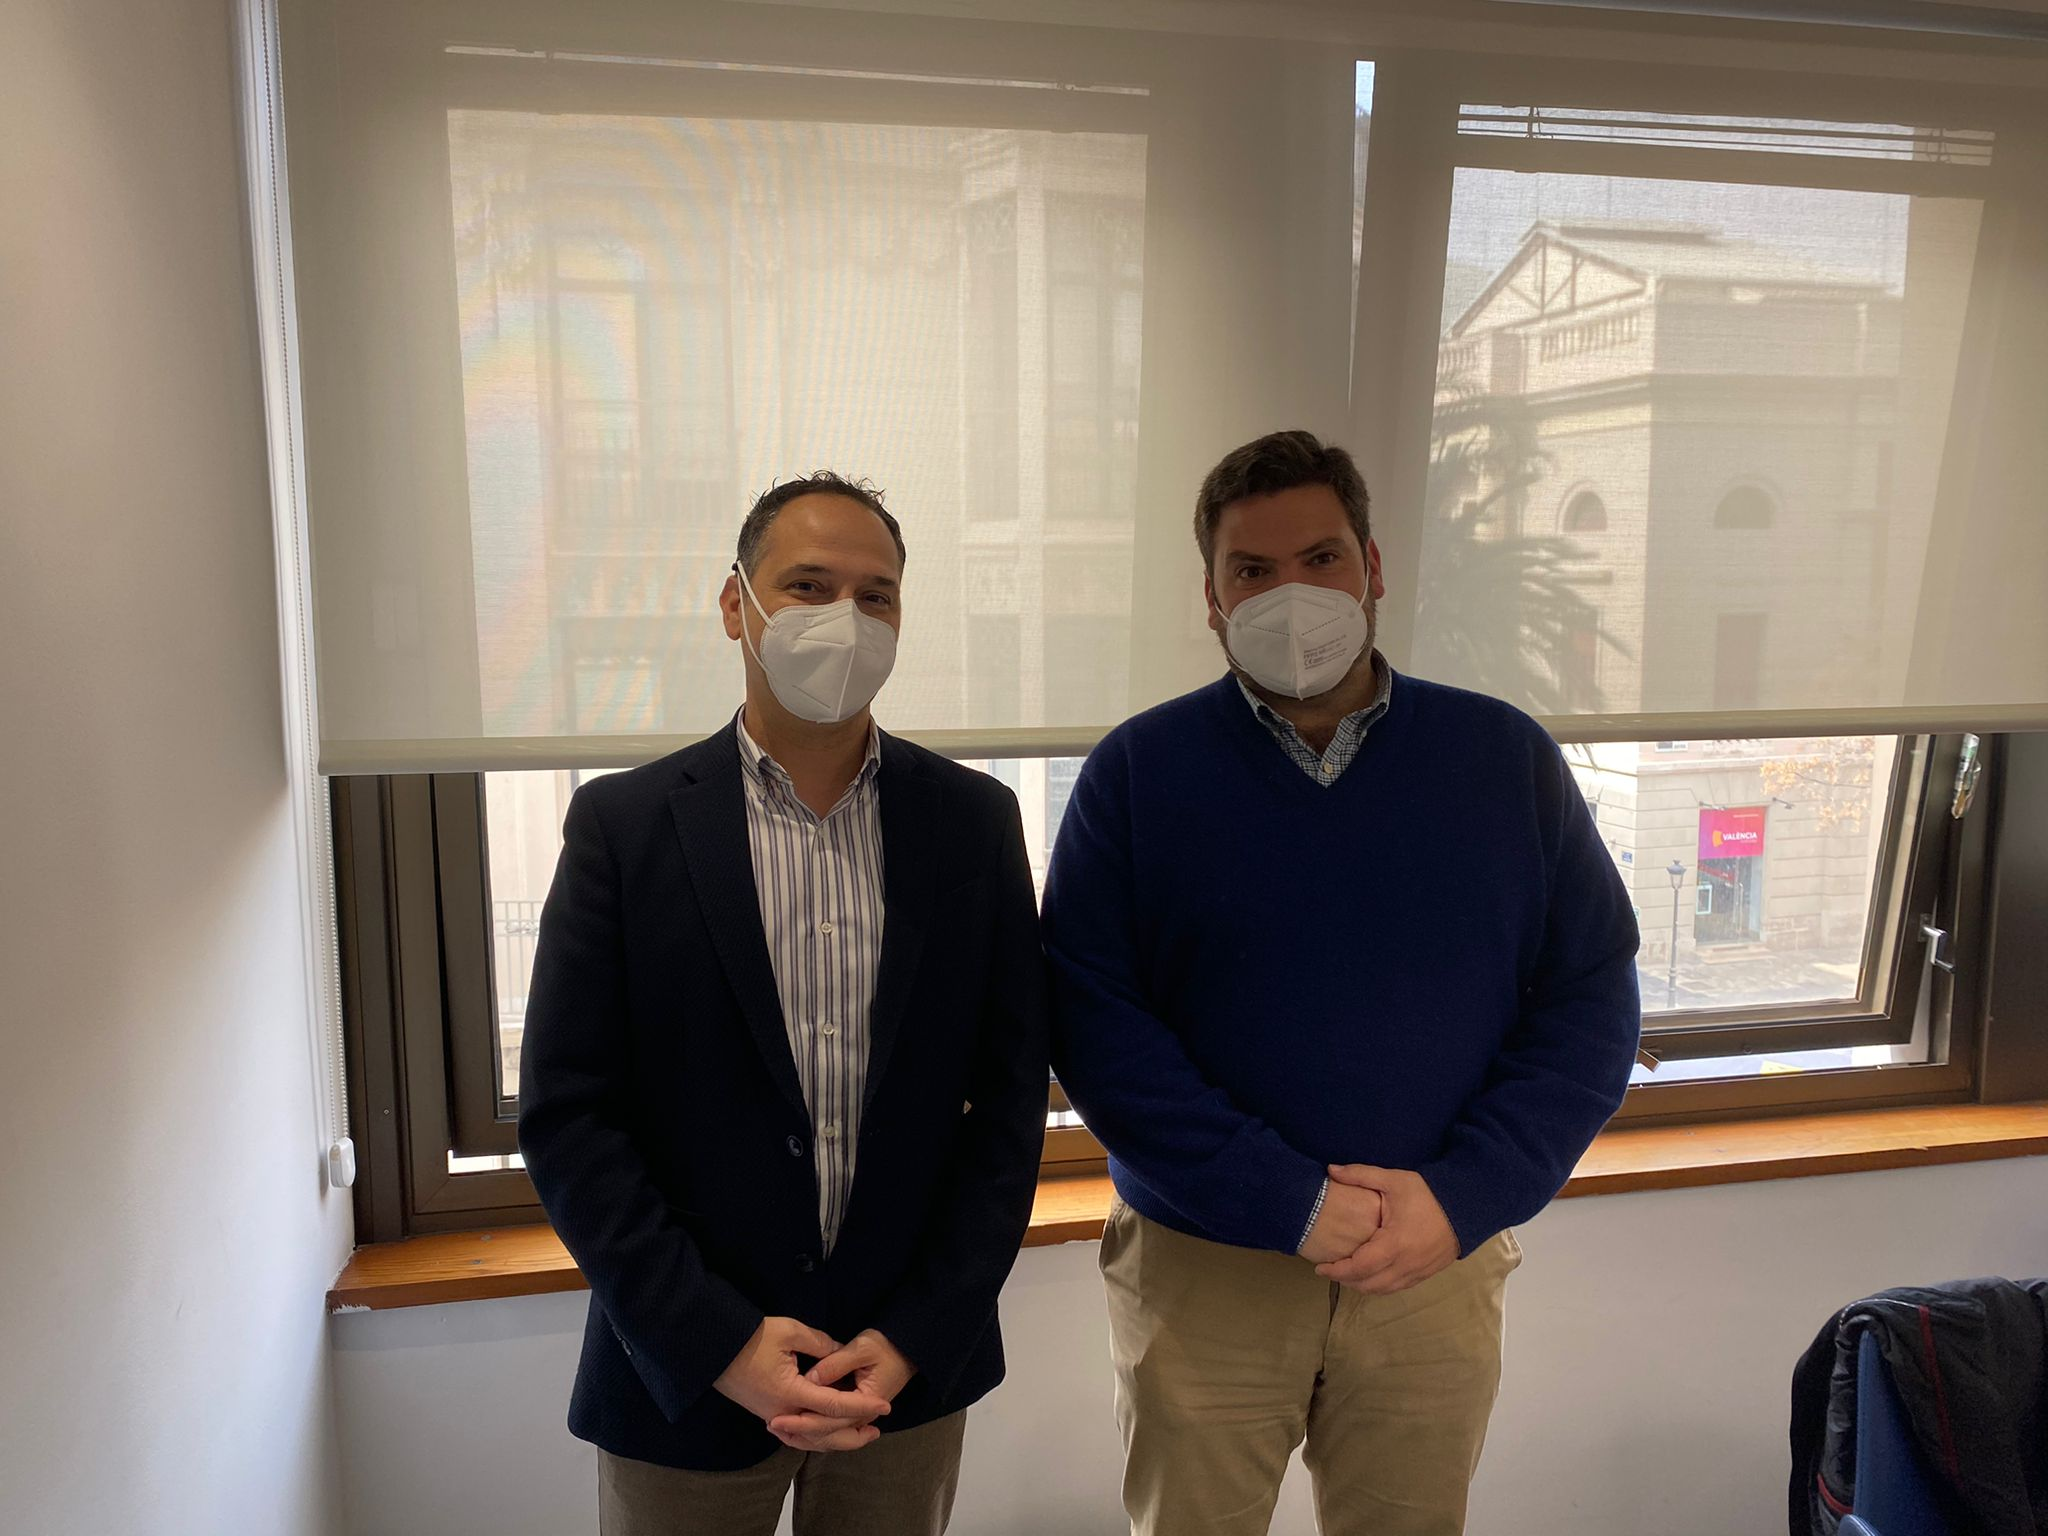 Laboratorio Químico Onubense se integra en el Grupo Eurofins Scientific